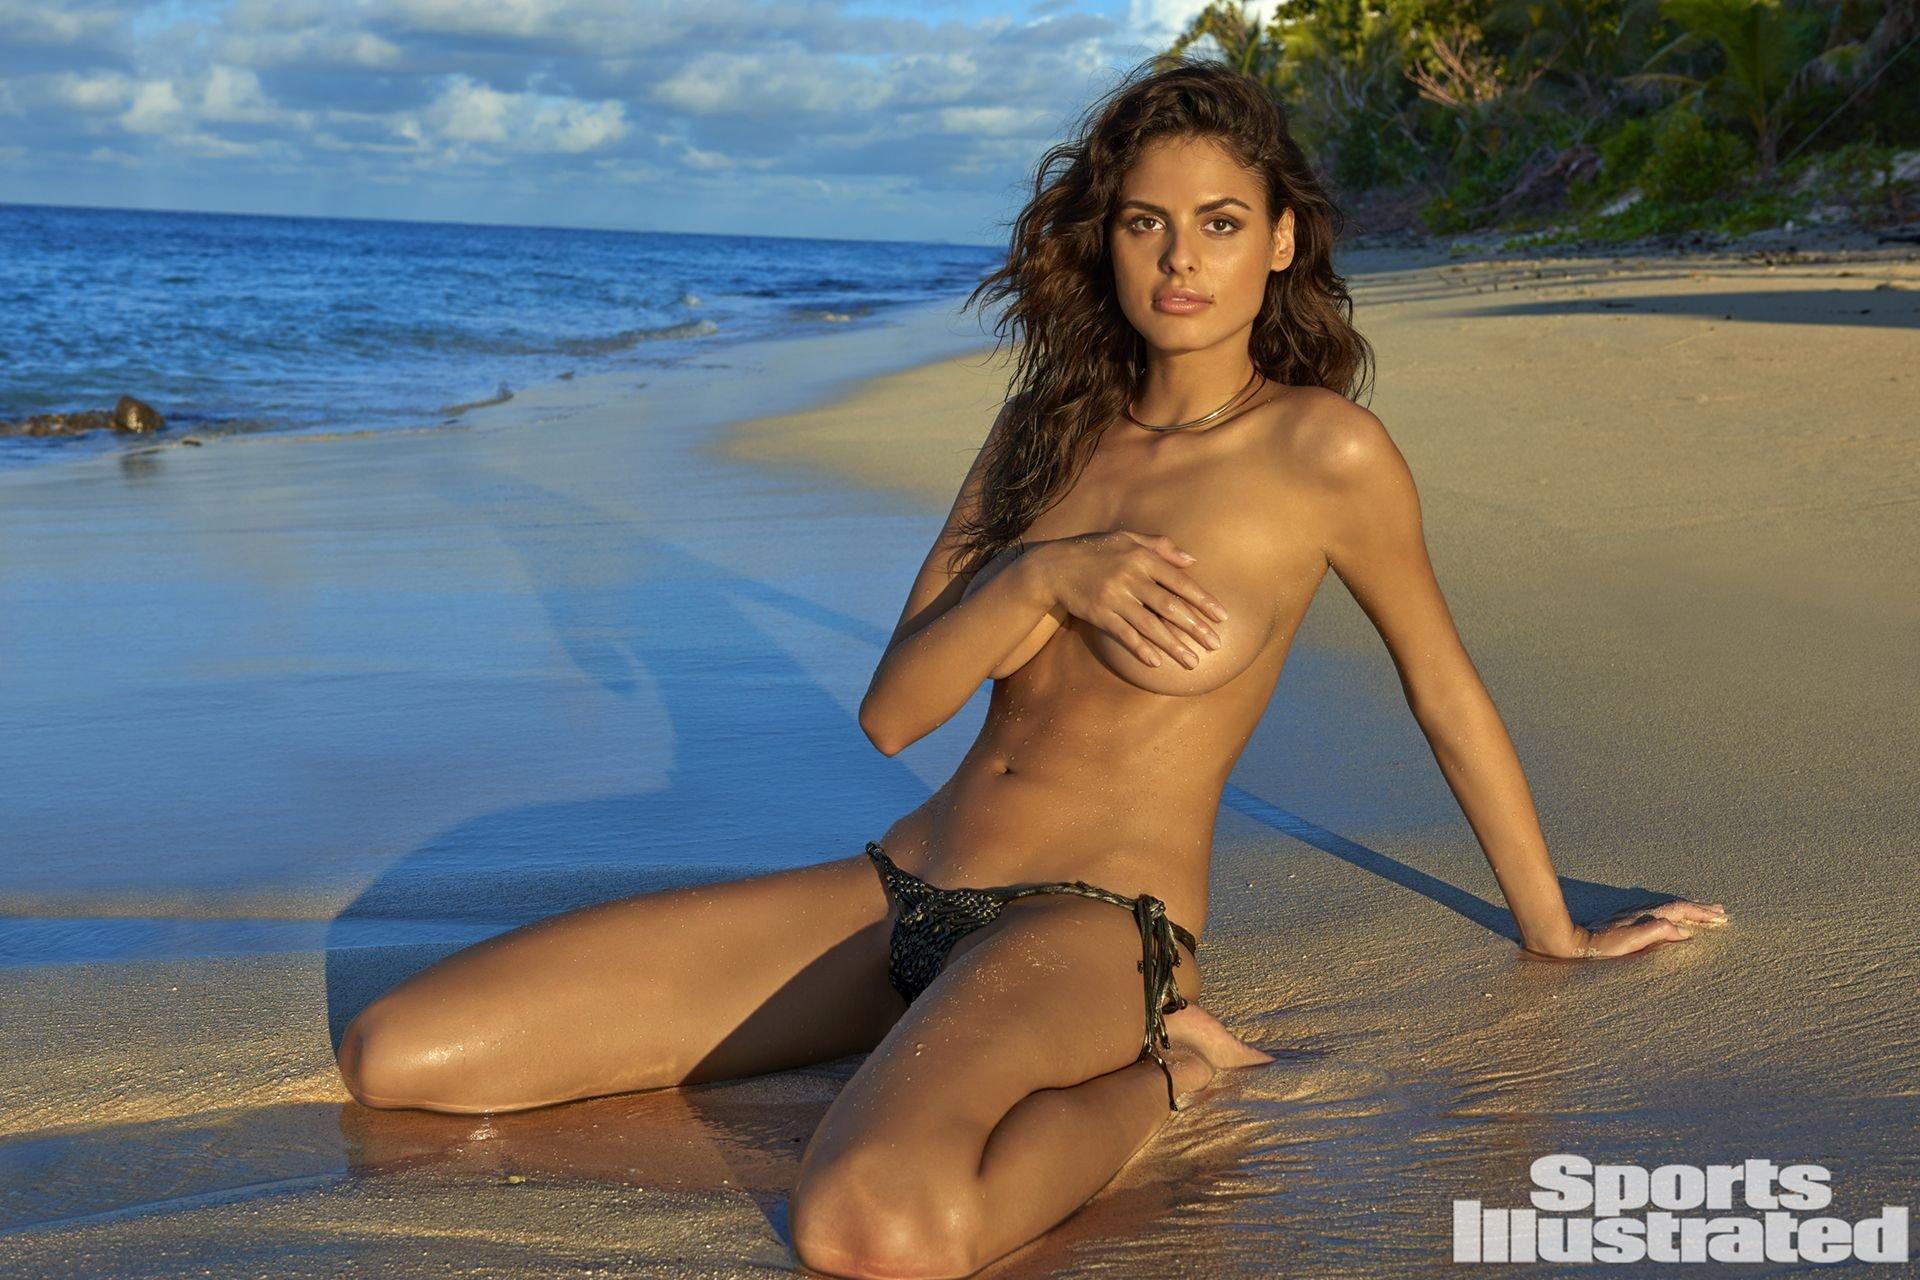 sarah mclachlan bikini